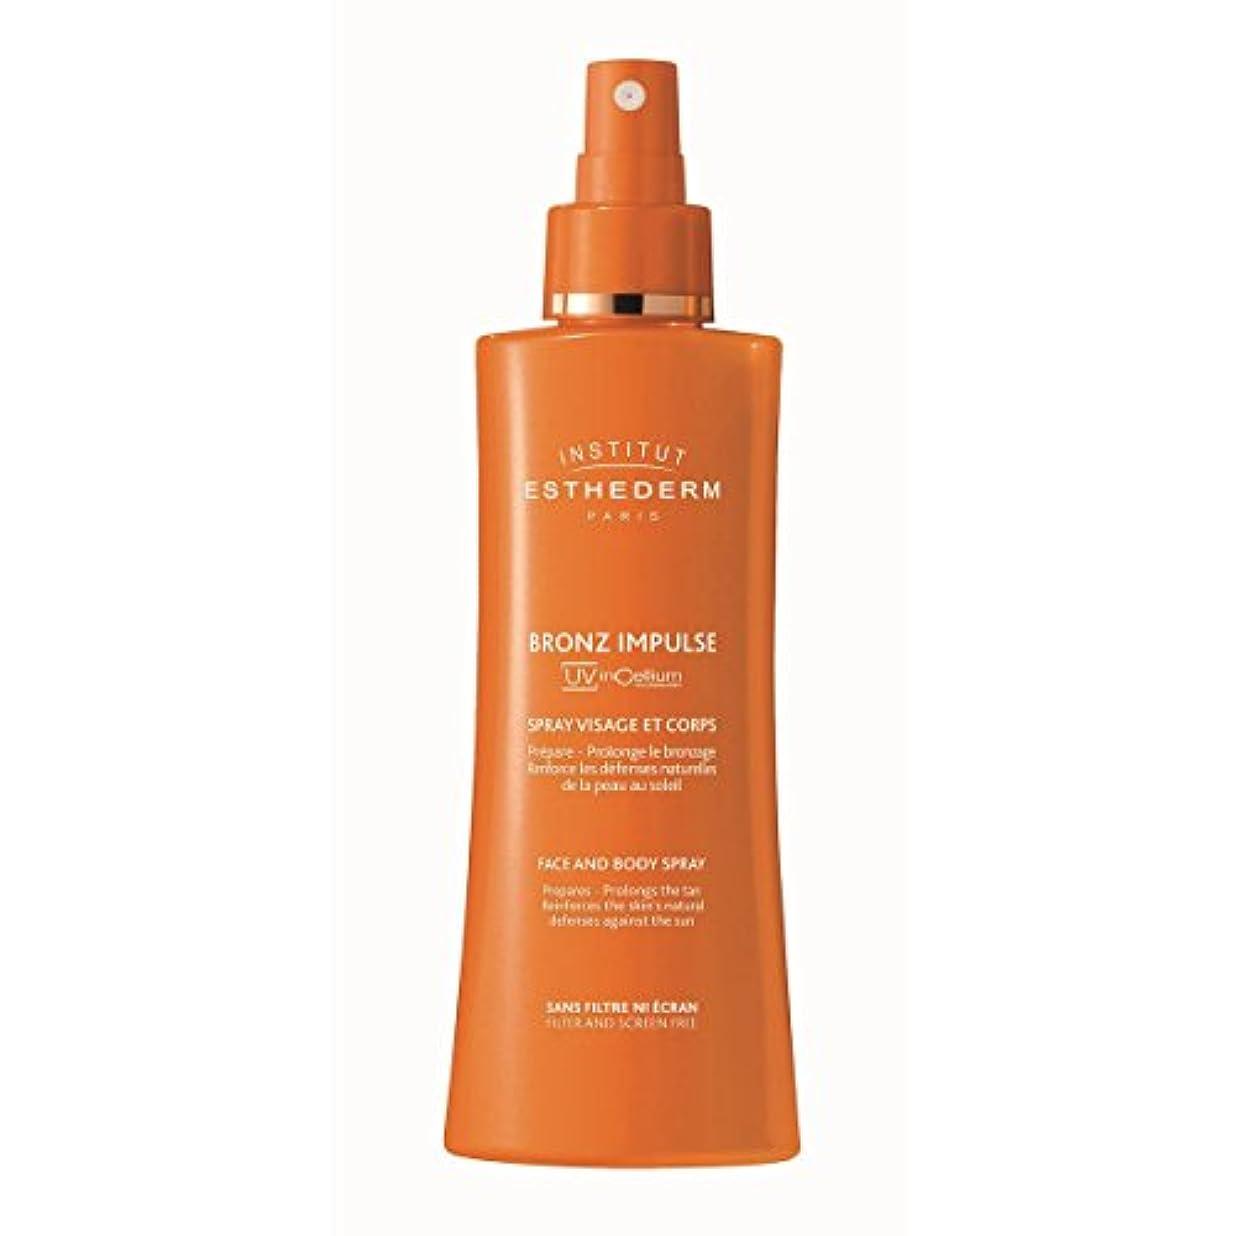 Institut Esthederm Bronz Impulse Face And Body Spray 150ml [並行輸入品]